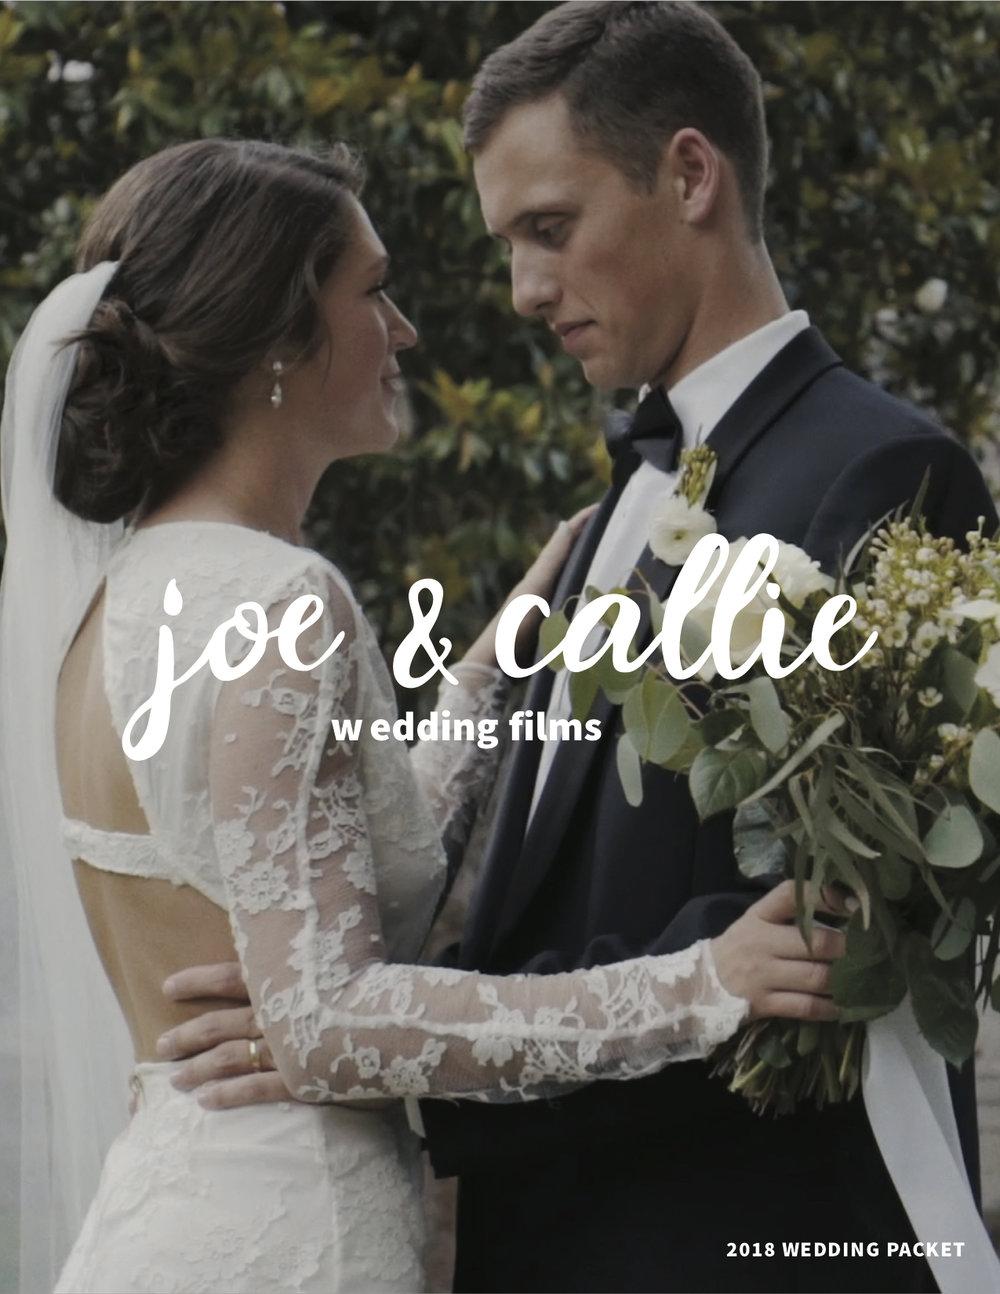 JoeandCallie_2018WeddingInfo.jpg